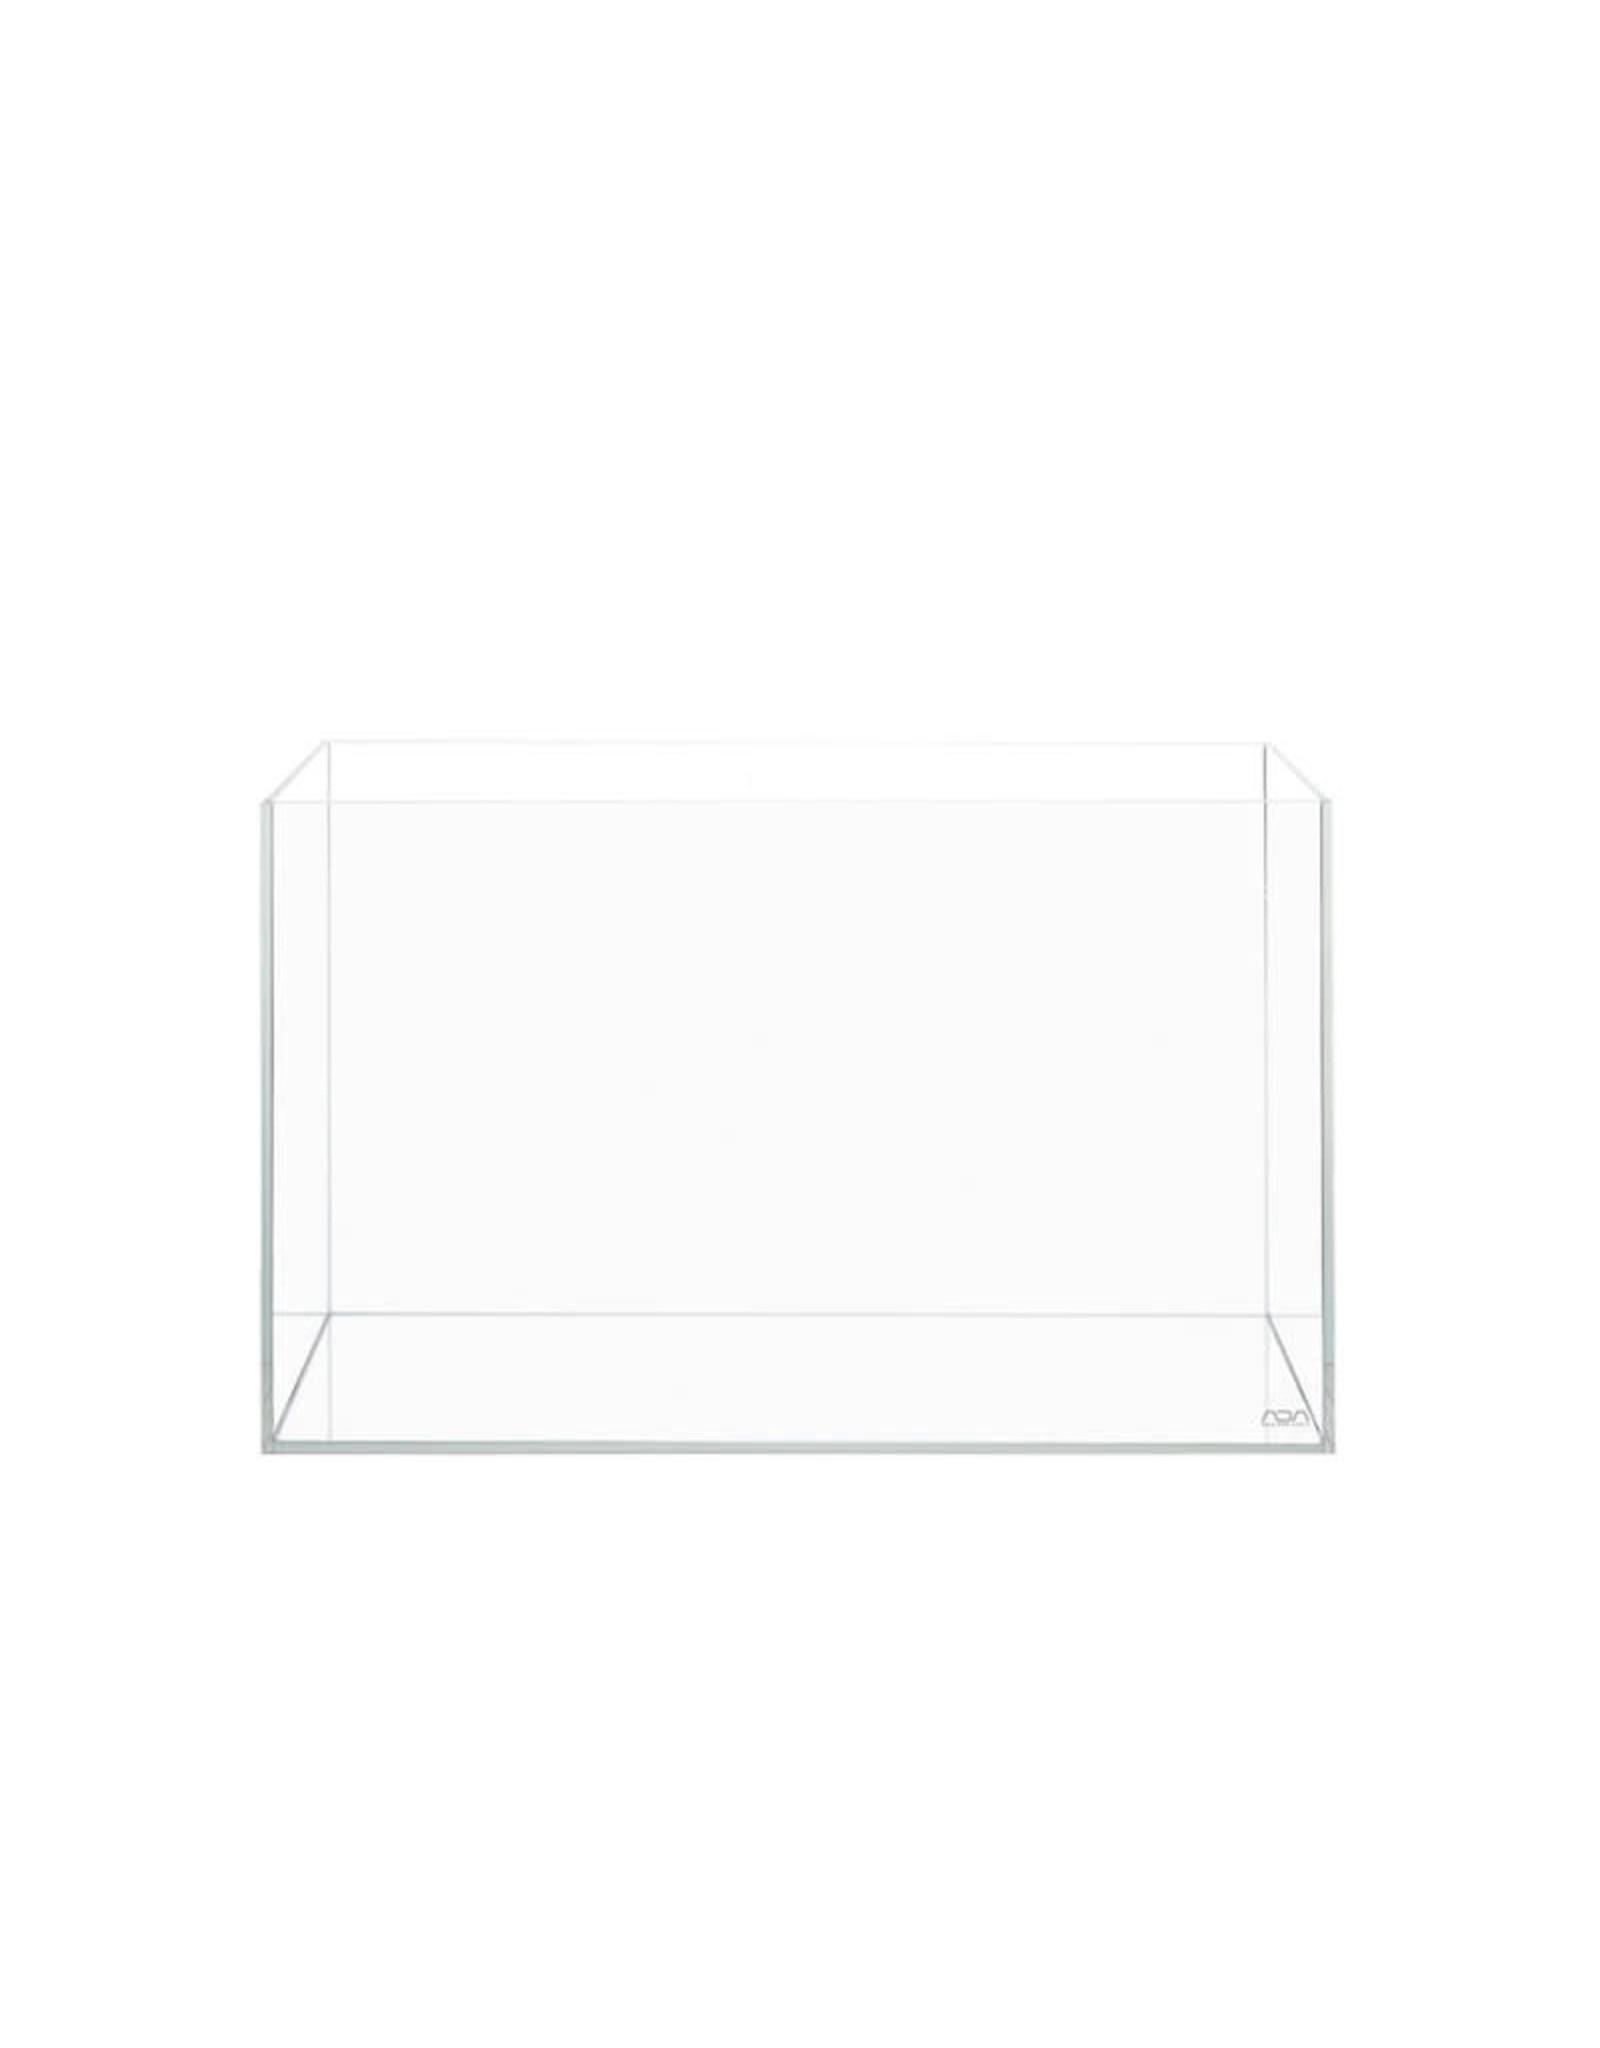 ADA Cube Garden 60-F (60x30x18cm/5mm)